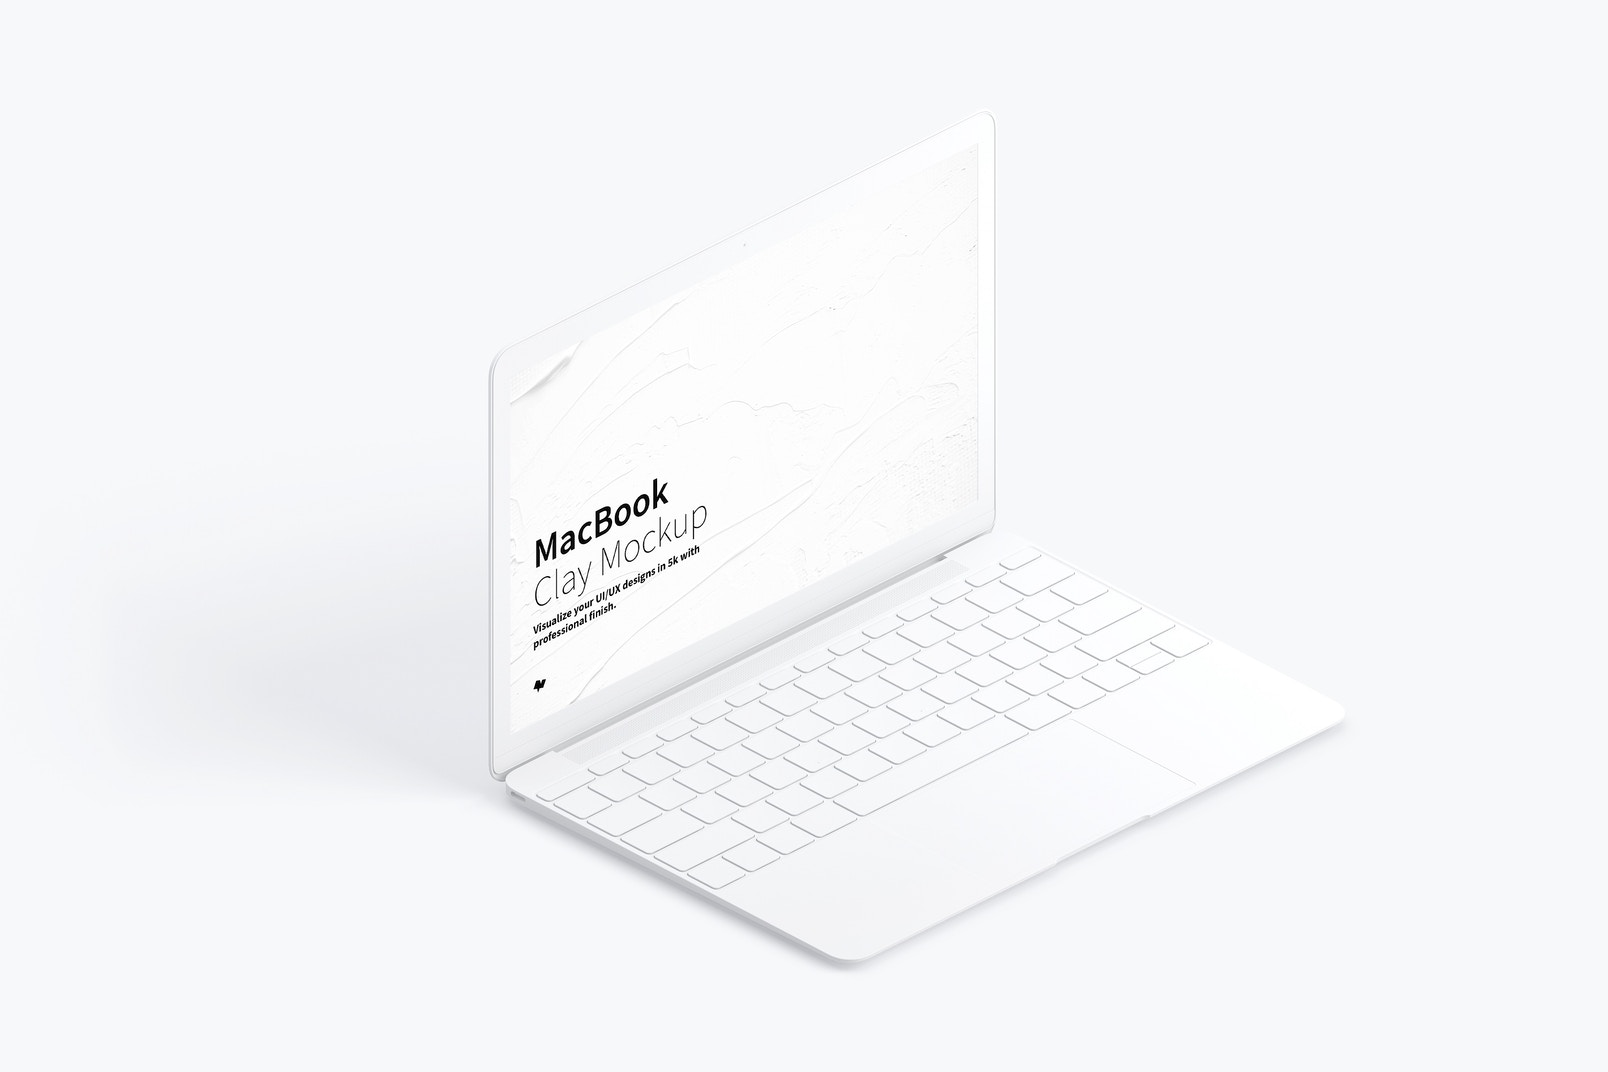 Clay MacBook Mockup, Isometric Left View